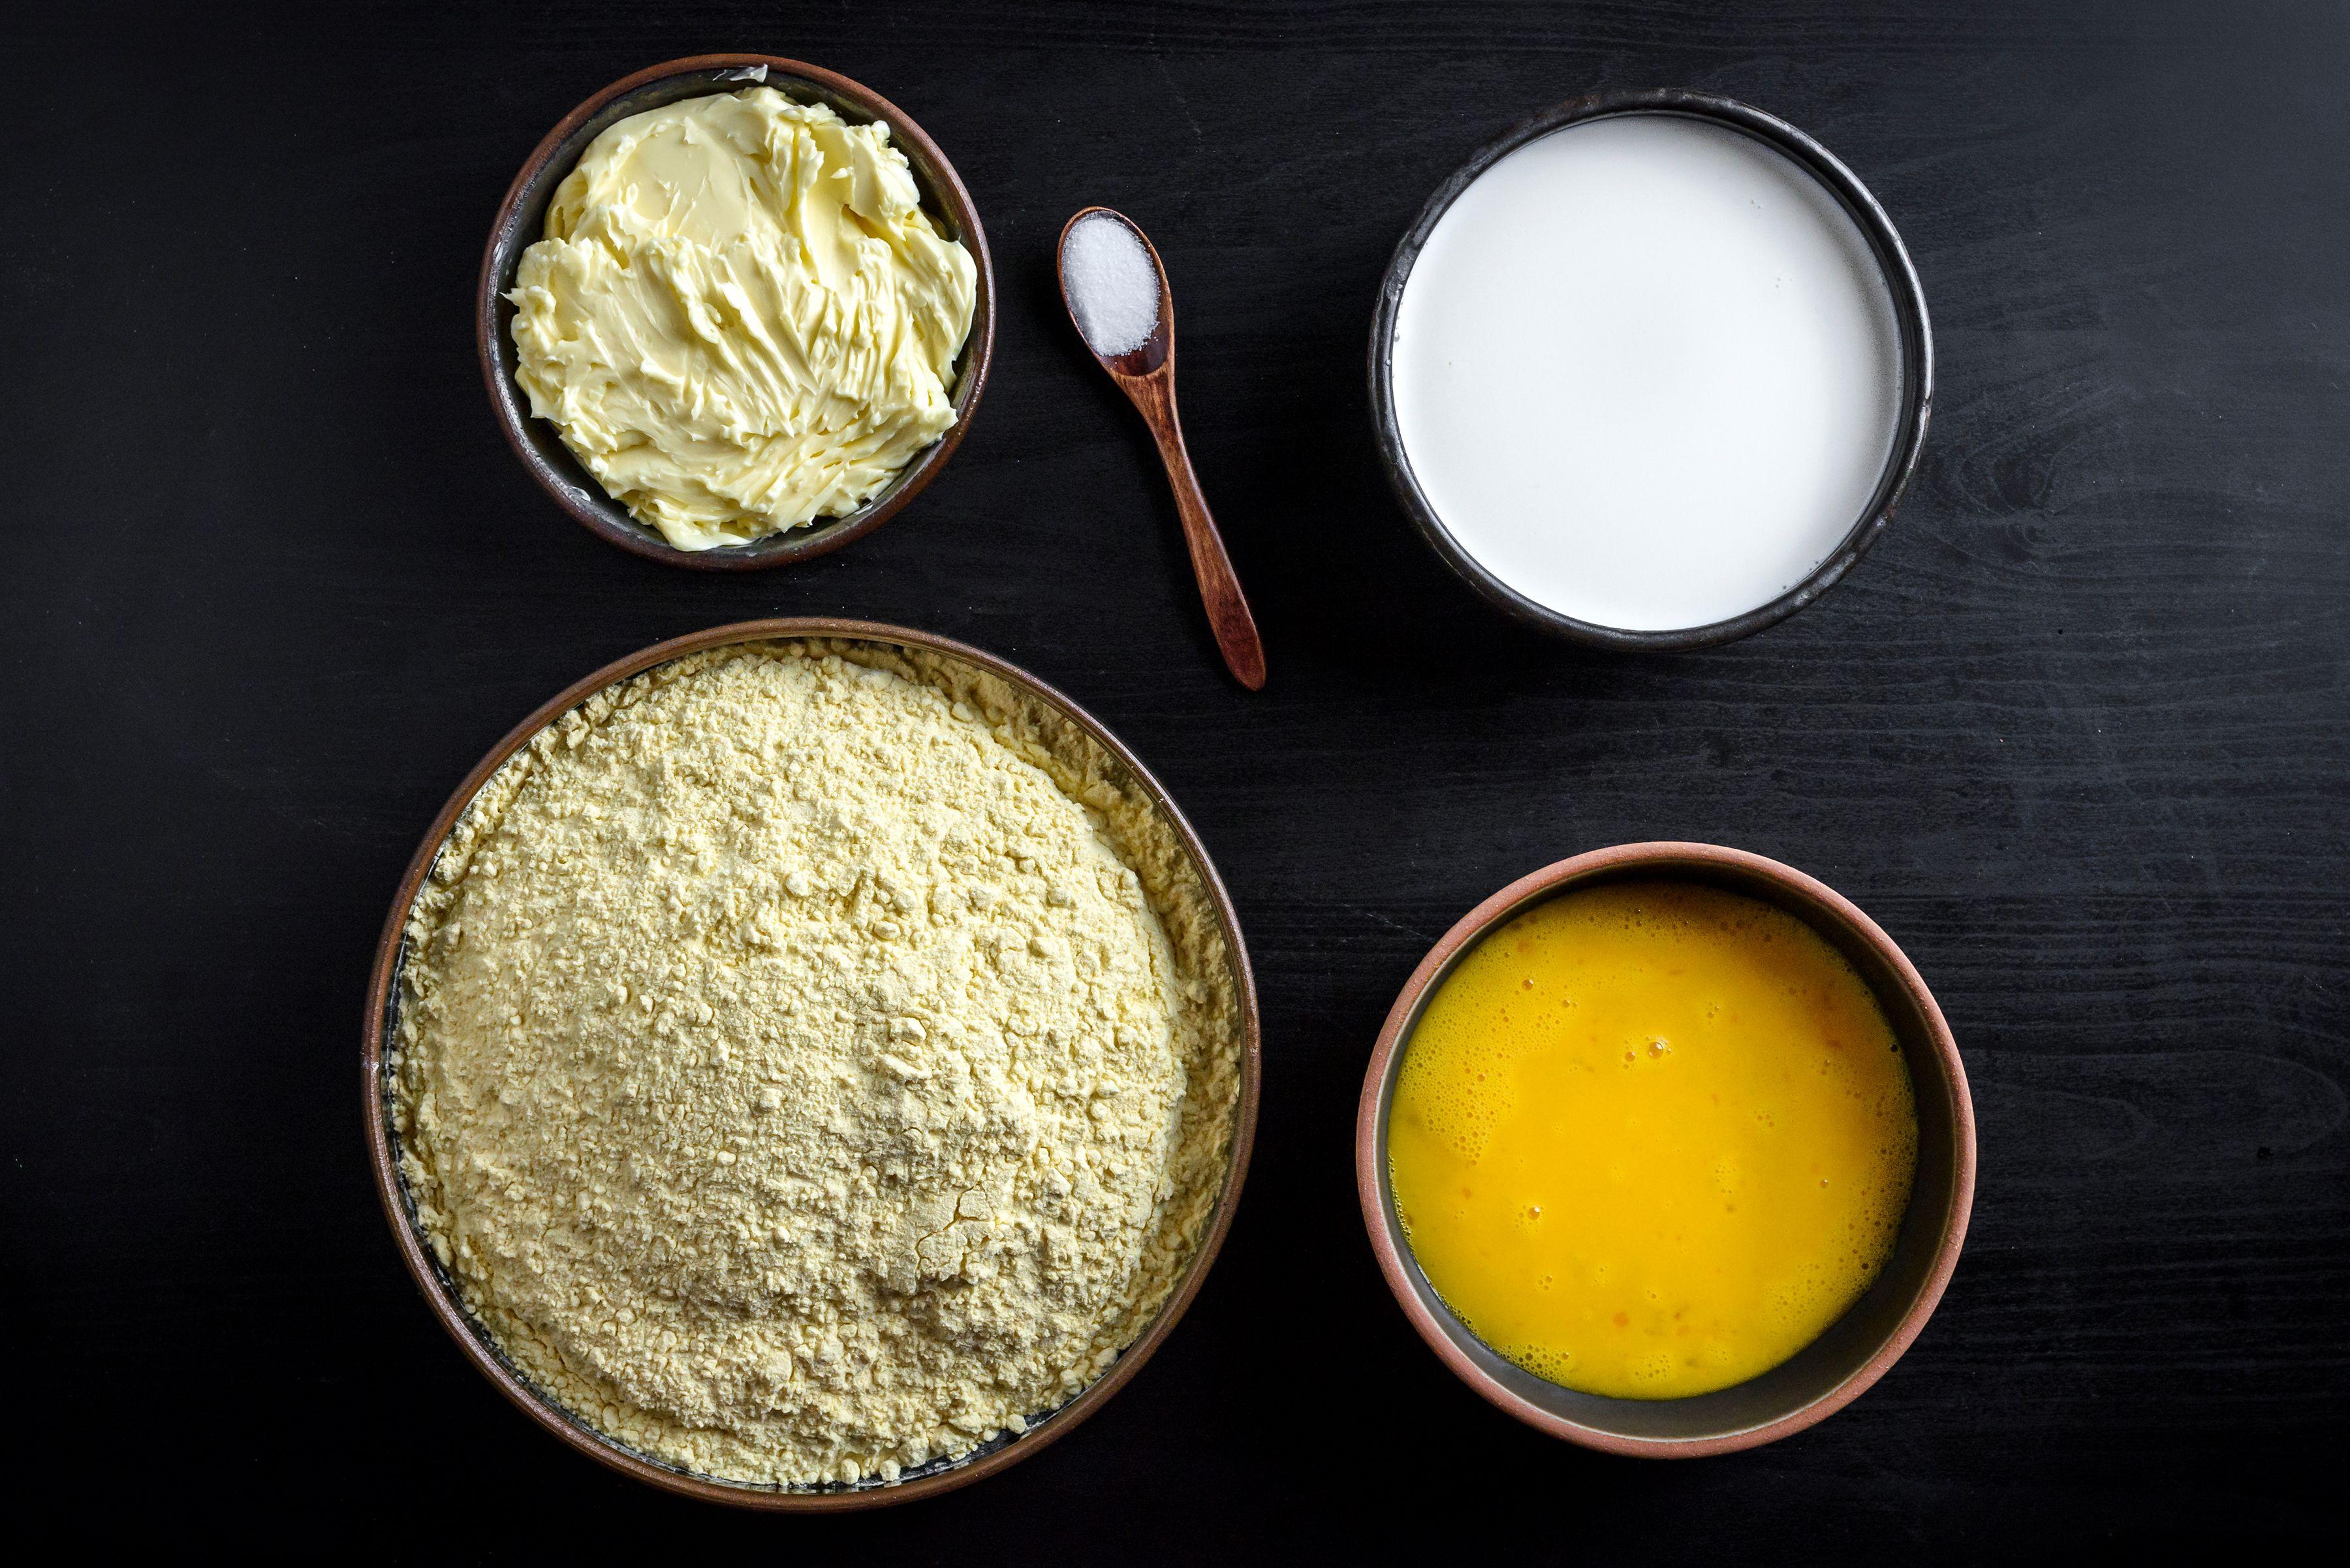 Ingredients for Serbian corn bread